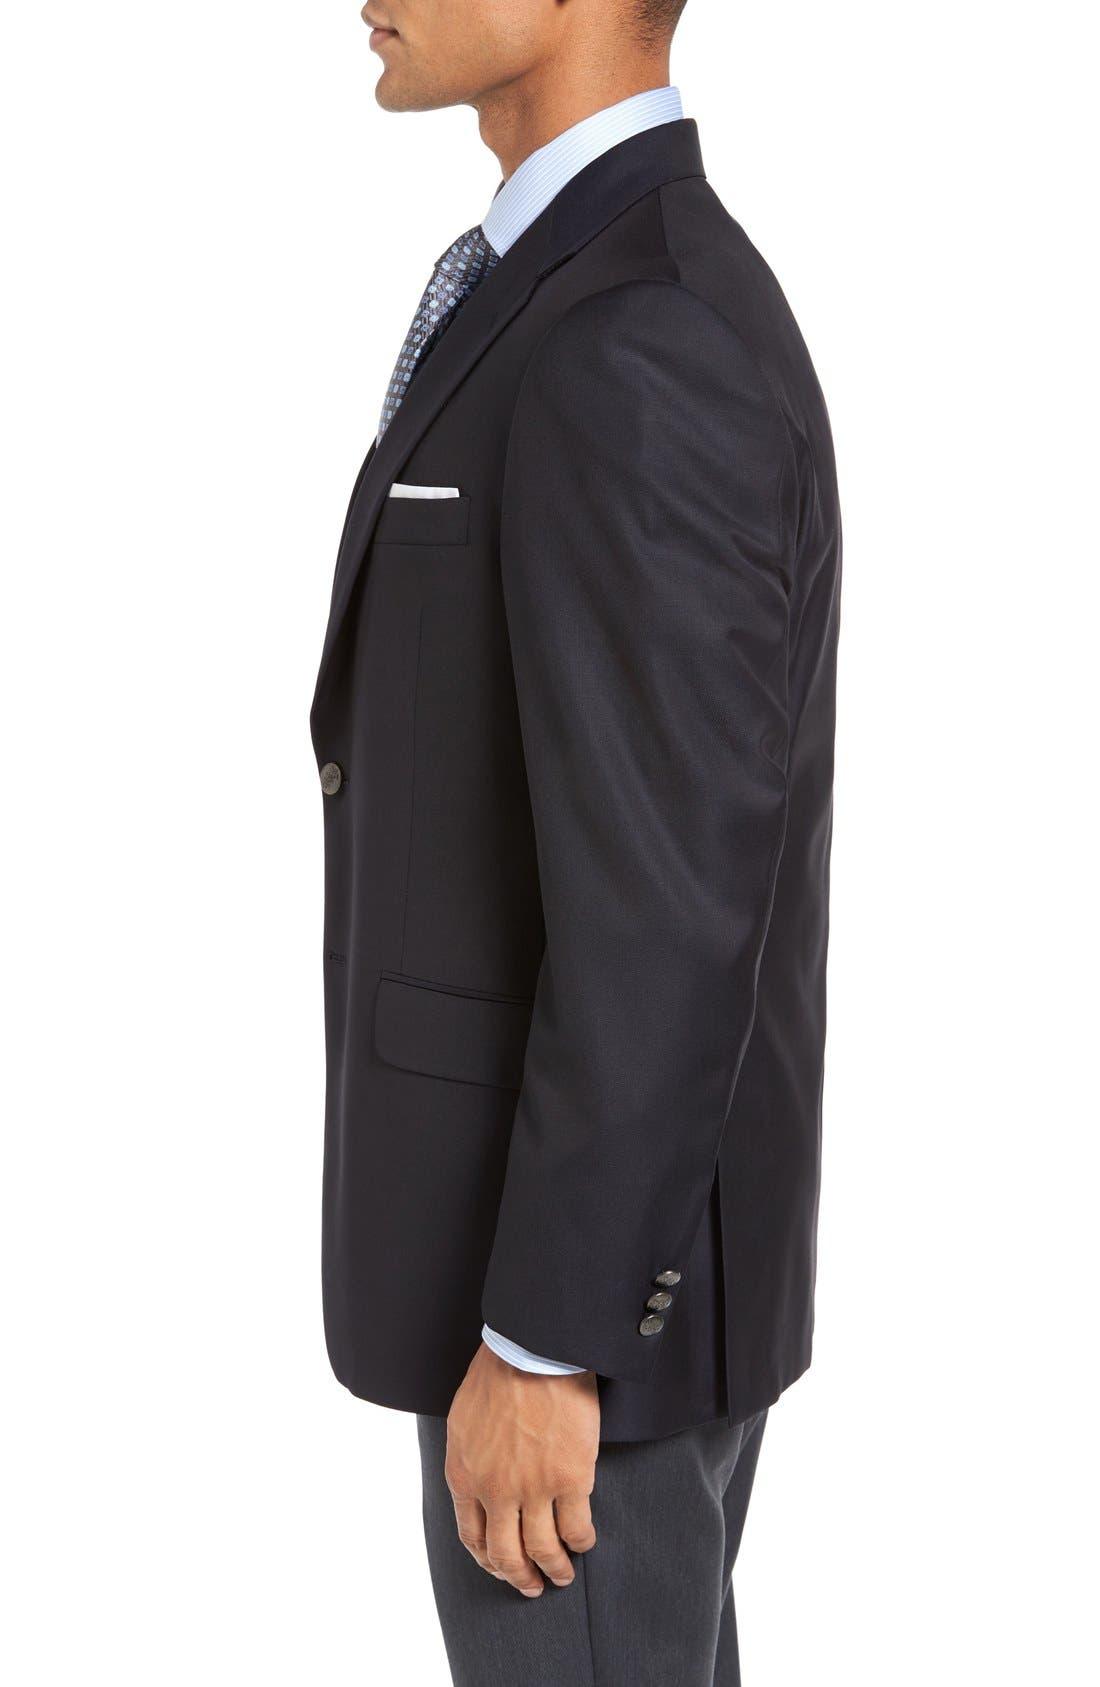 HICKEY FREEMAN, Classic B Fit Wool Travel Blazer, Alternate thumbnail 3, color, NAVY